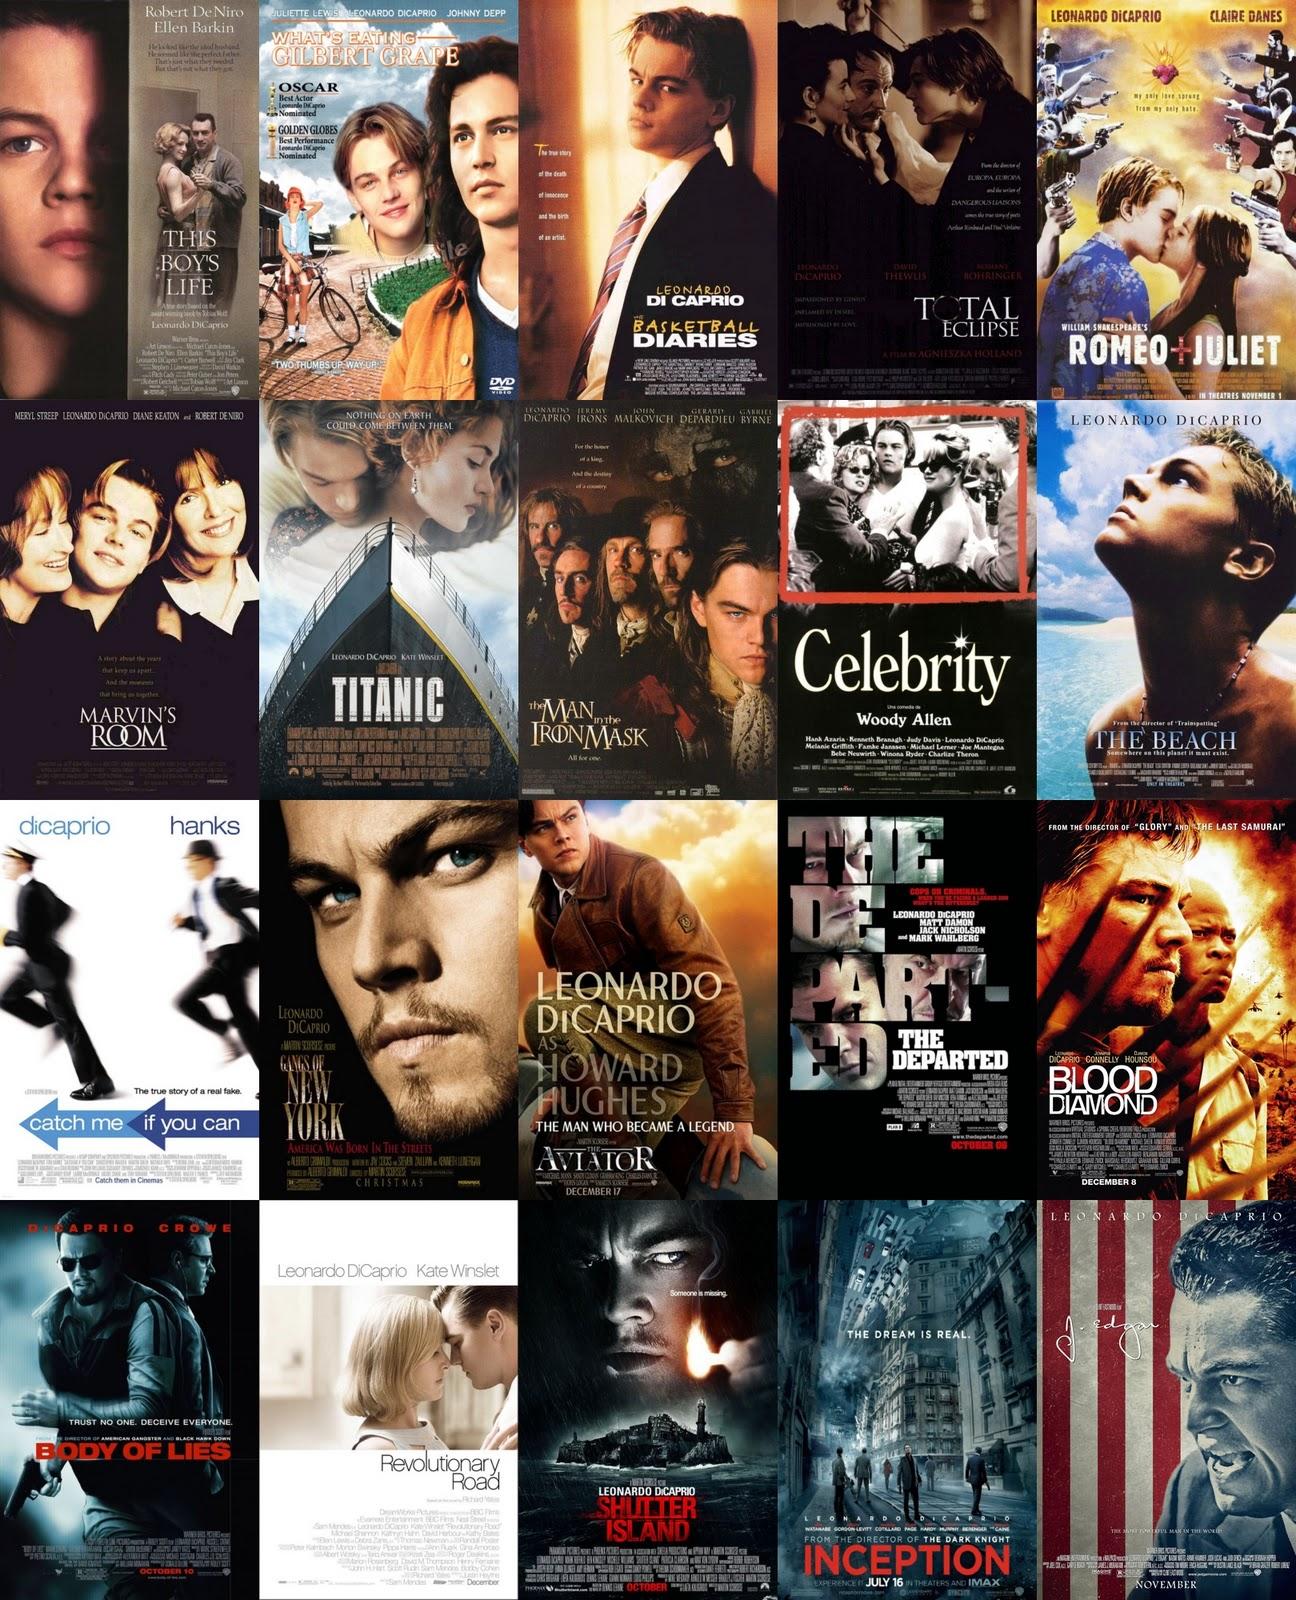 http://2.bp.blogspot.com/-8esEaC4gBBw/Tu-K5bTgoYI/AAAAAAAAHOQ/Lv02vEXnYtQ/s1600/Leonardo%2BDiCaprio%2BMovies%2BCollection.jpg